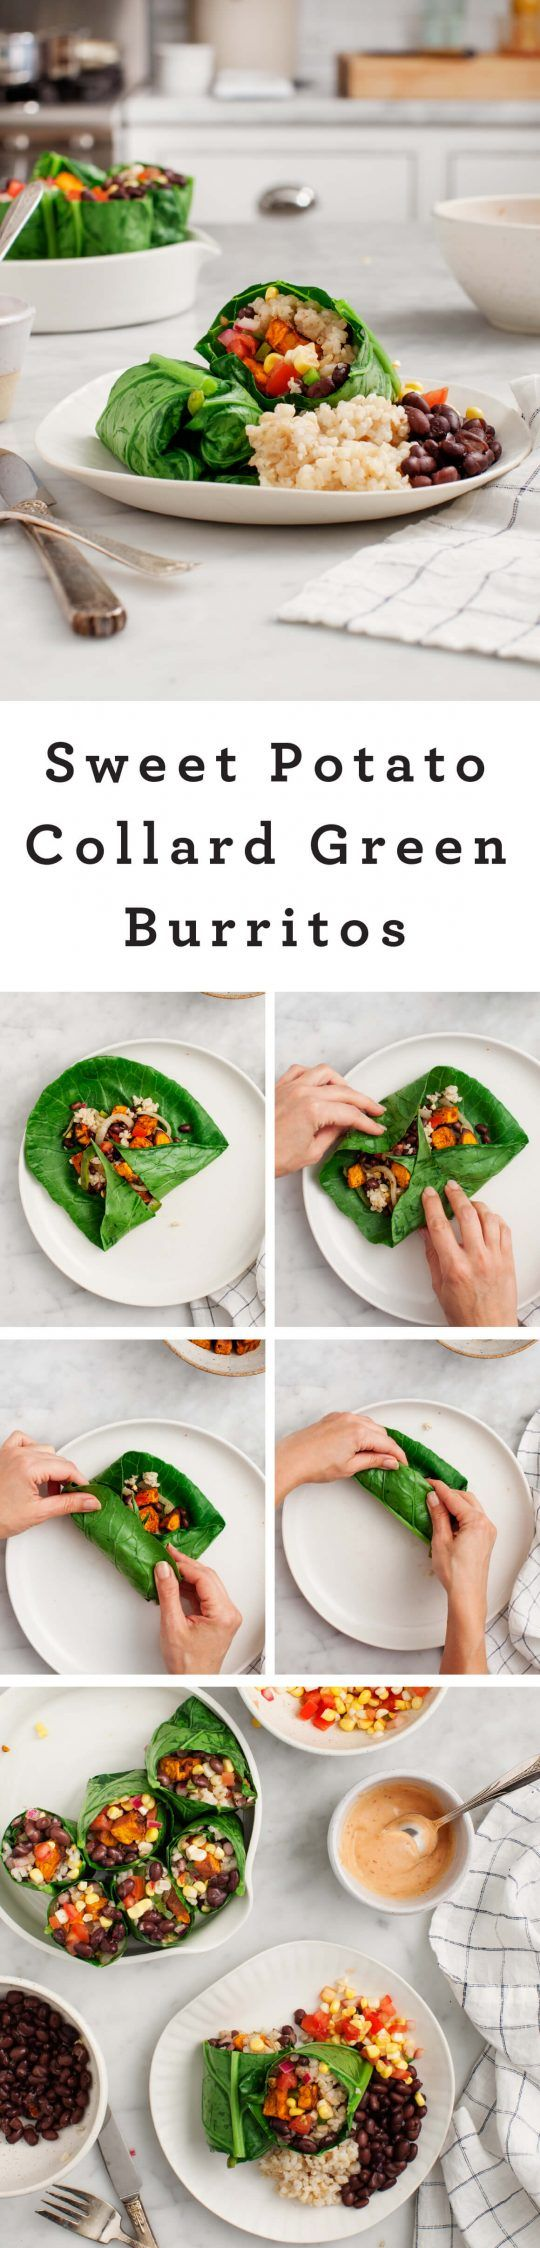 Sweet Potato Collard Green Burritos